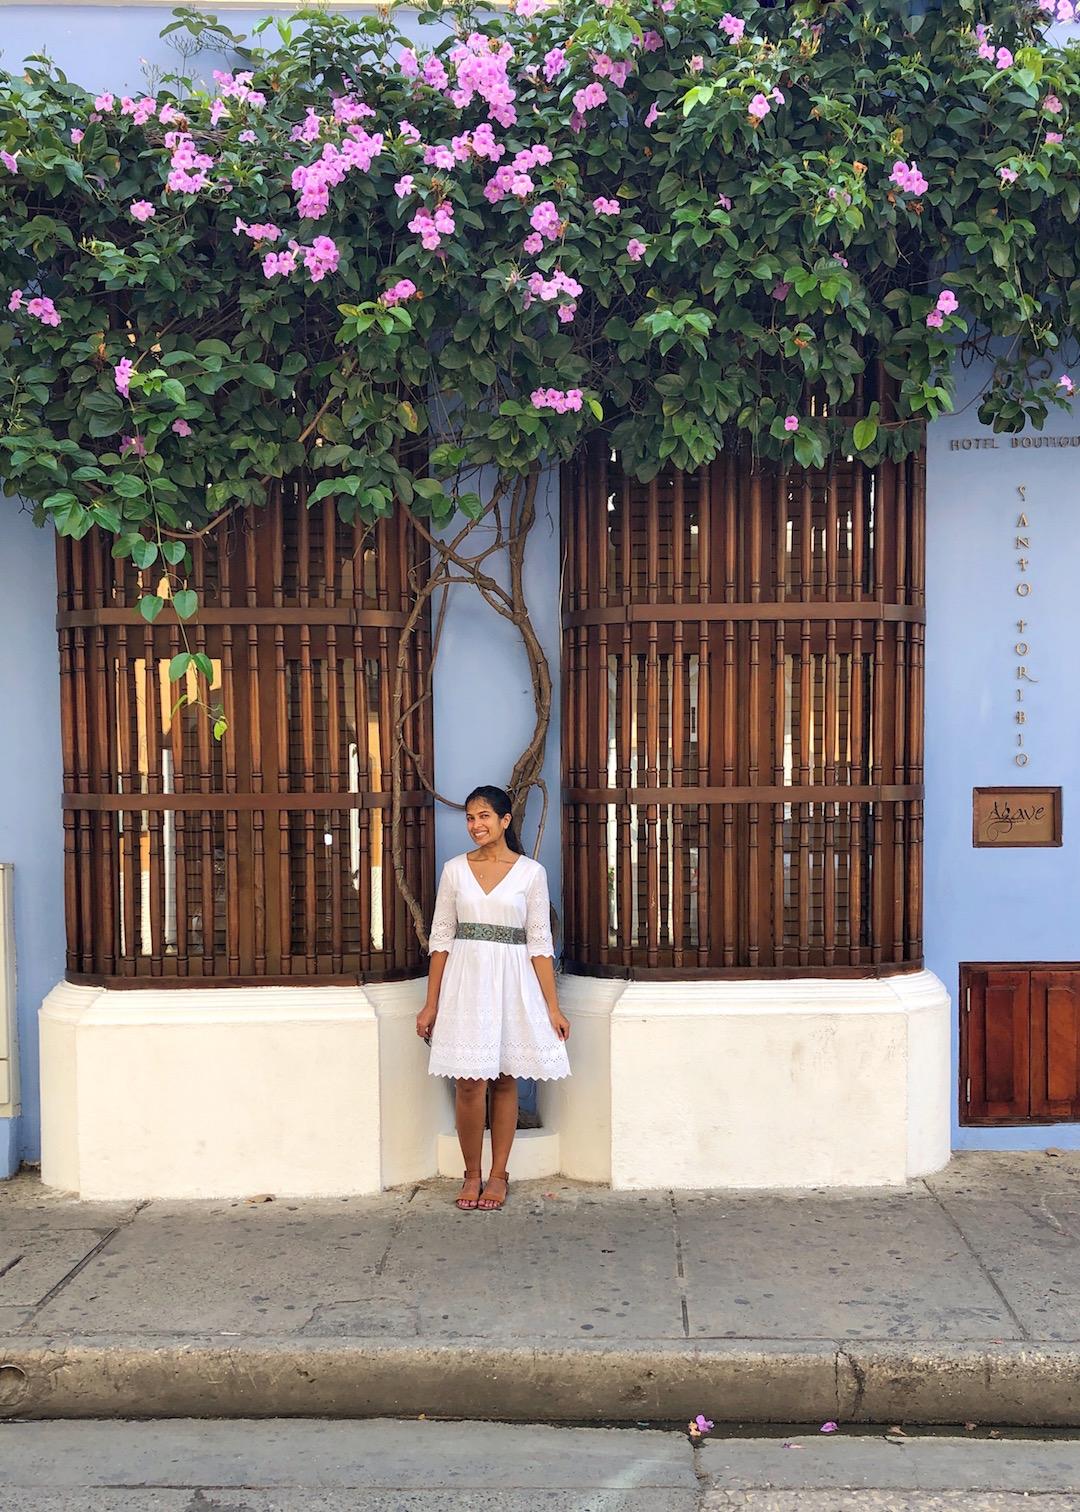 Pretty Windows in Cartagena